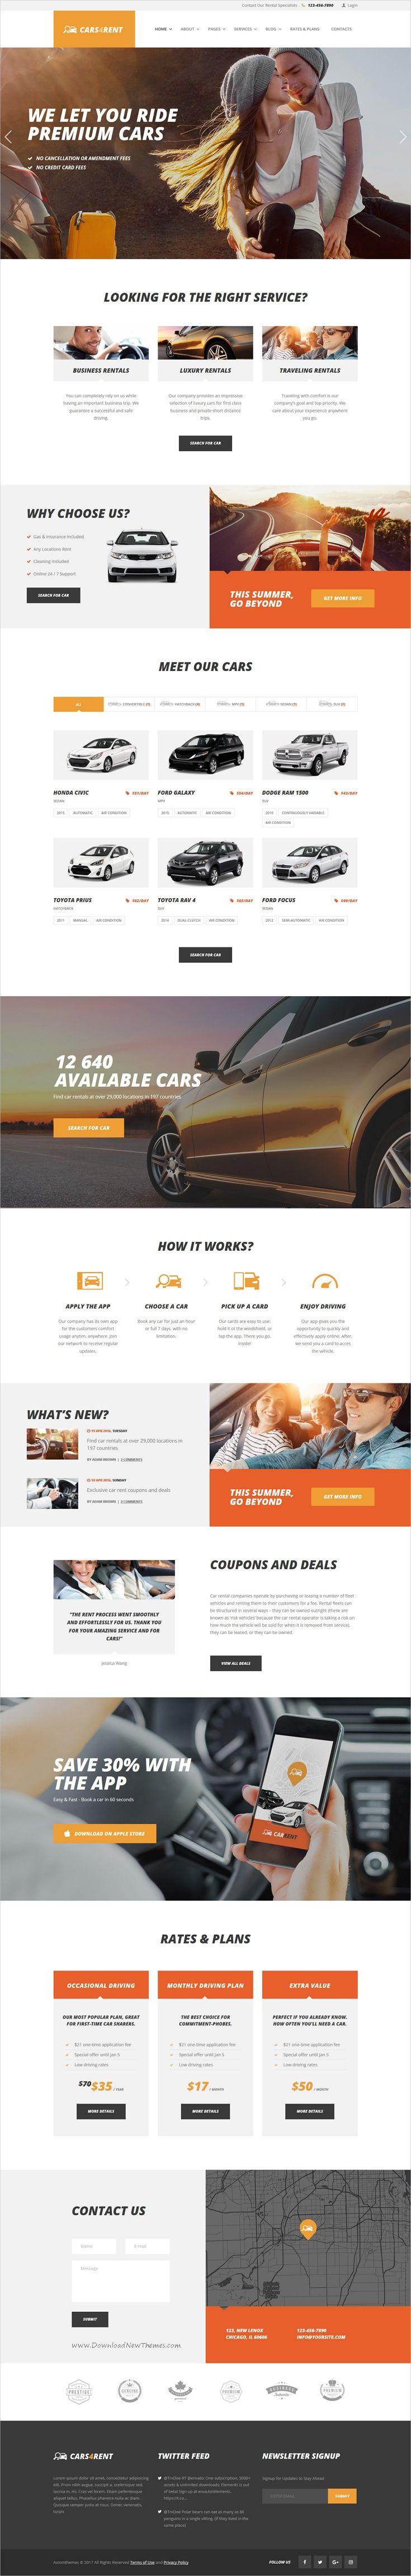 Car Rental Websites >> Pin By Okan Yikmis On User Interface Design Ideas Online Car